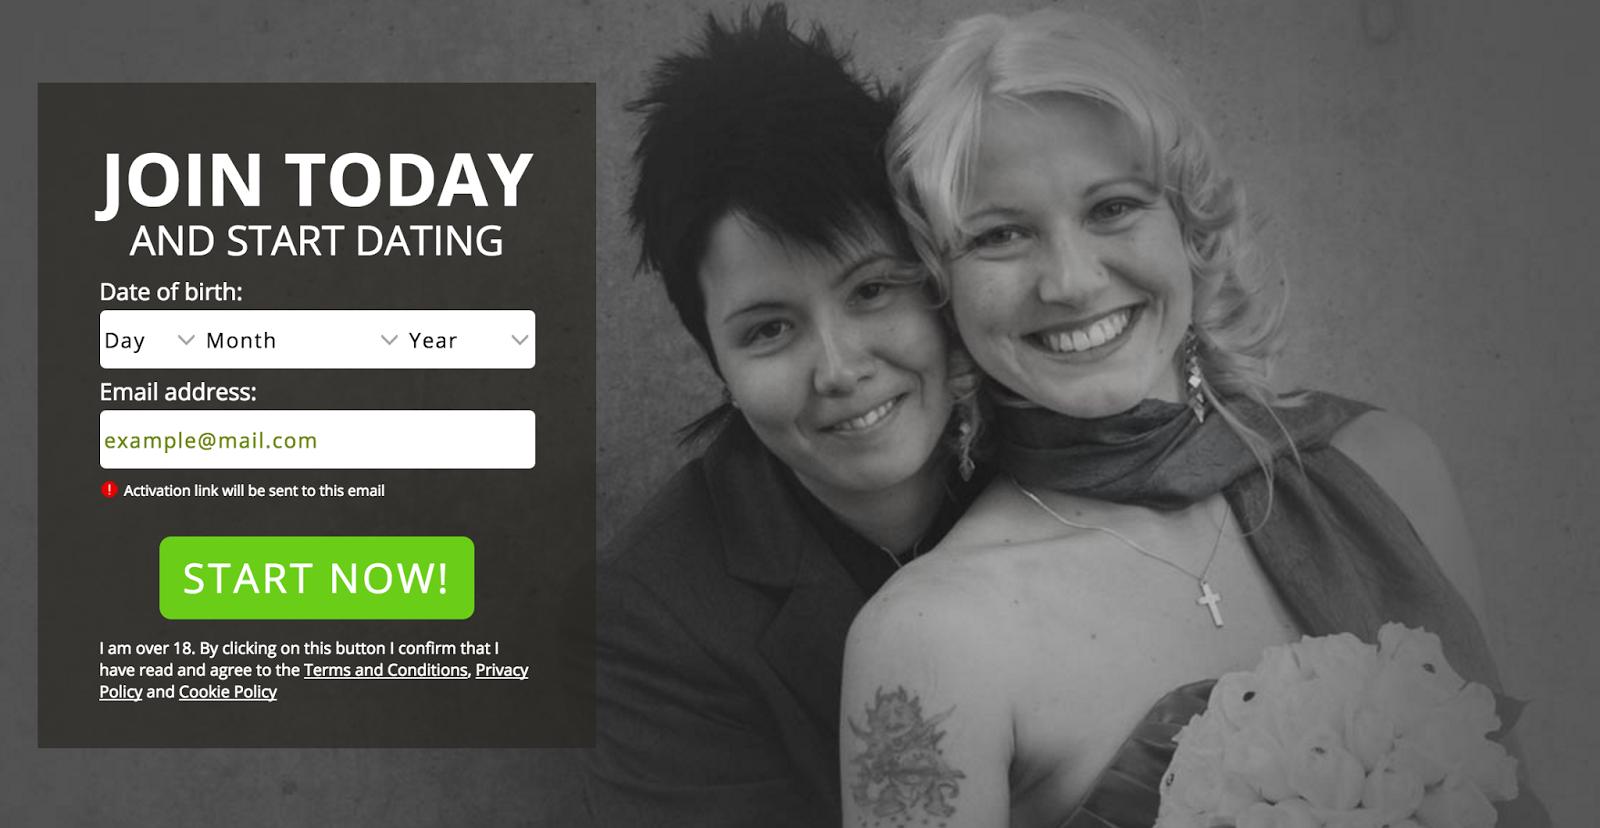 Avatar legenden om aang online dating